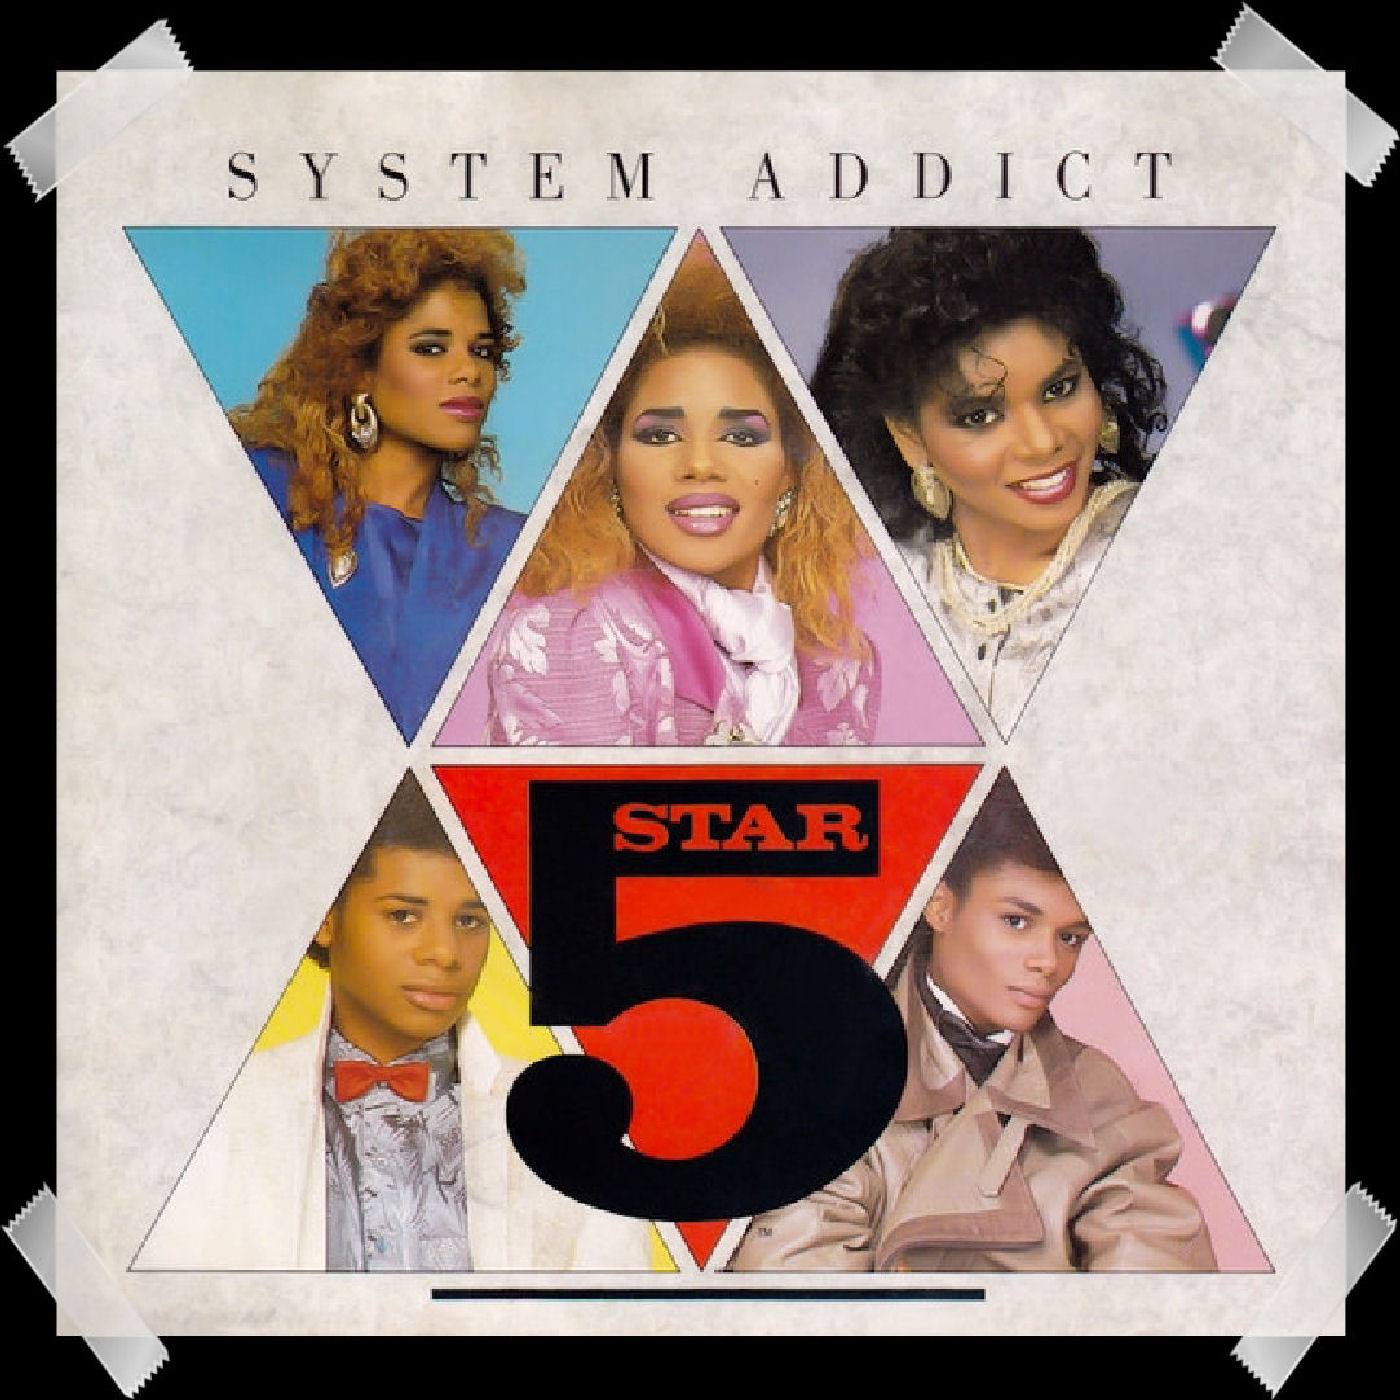 09. Five Star - System Addict